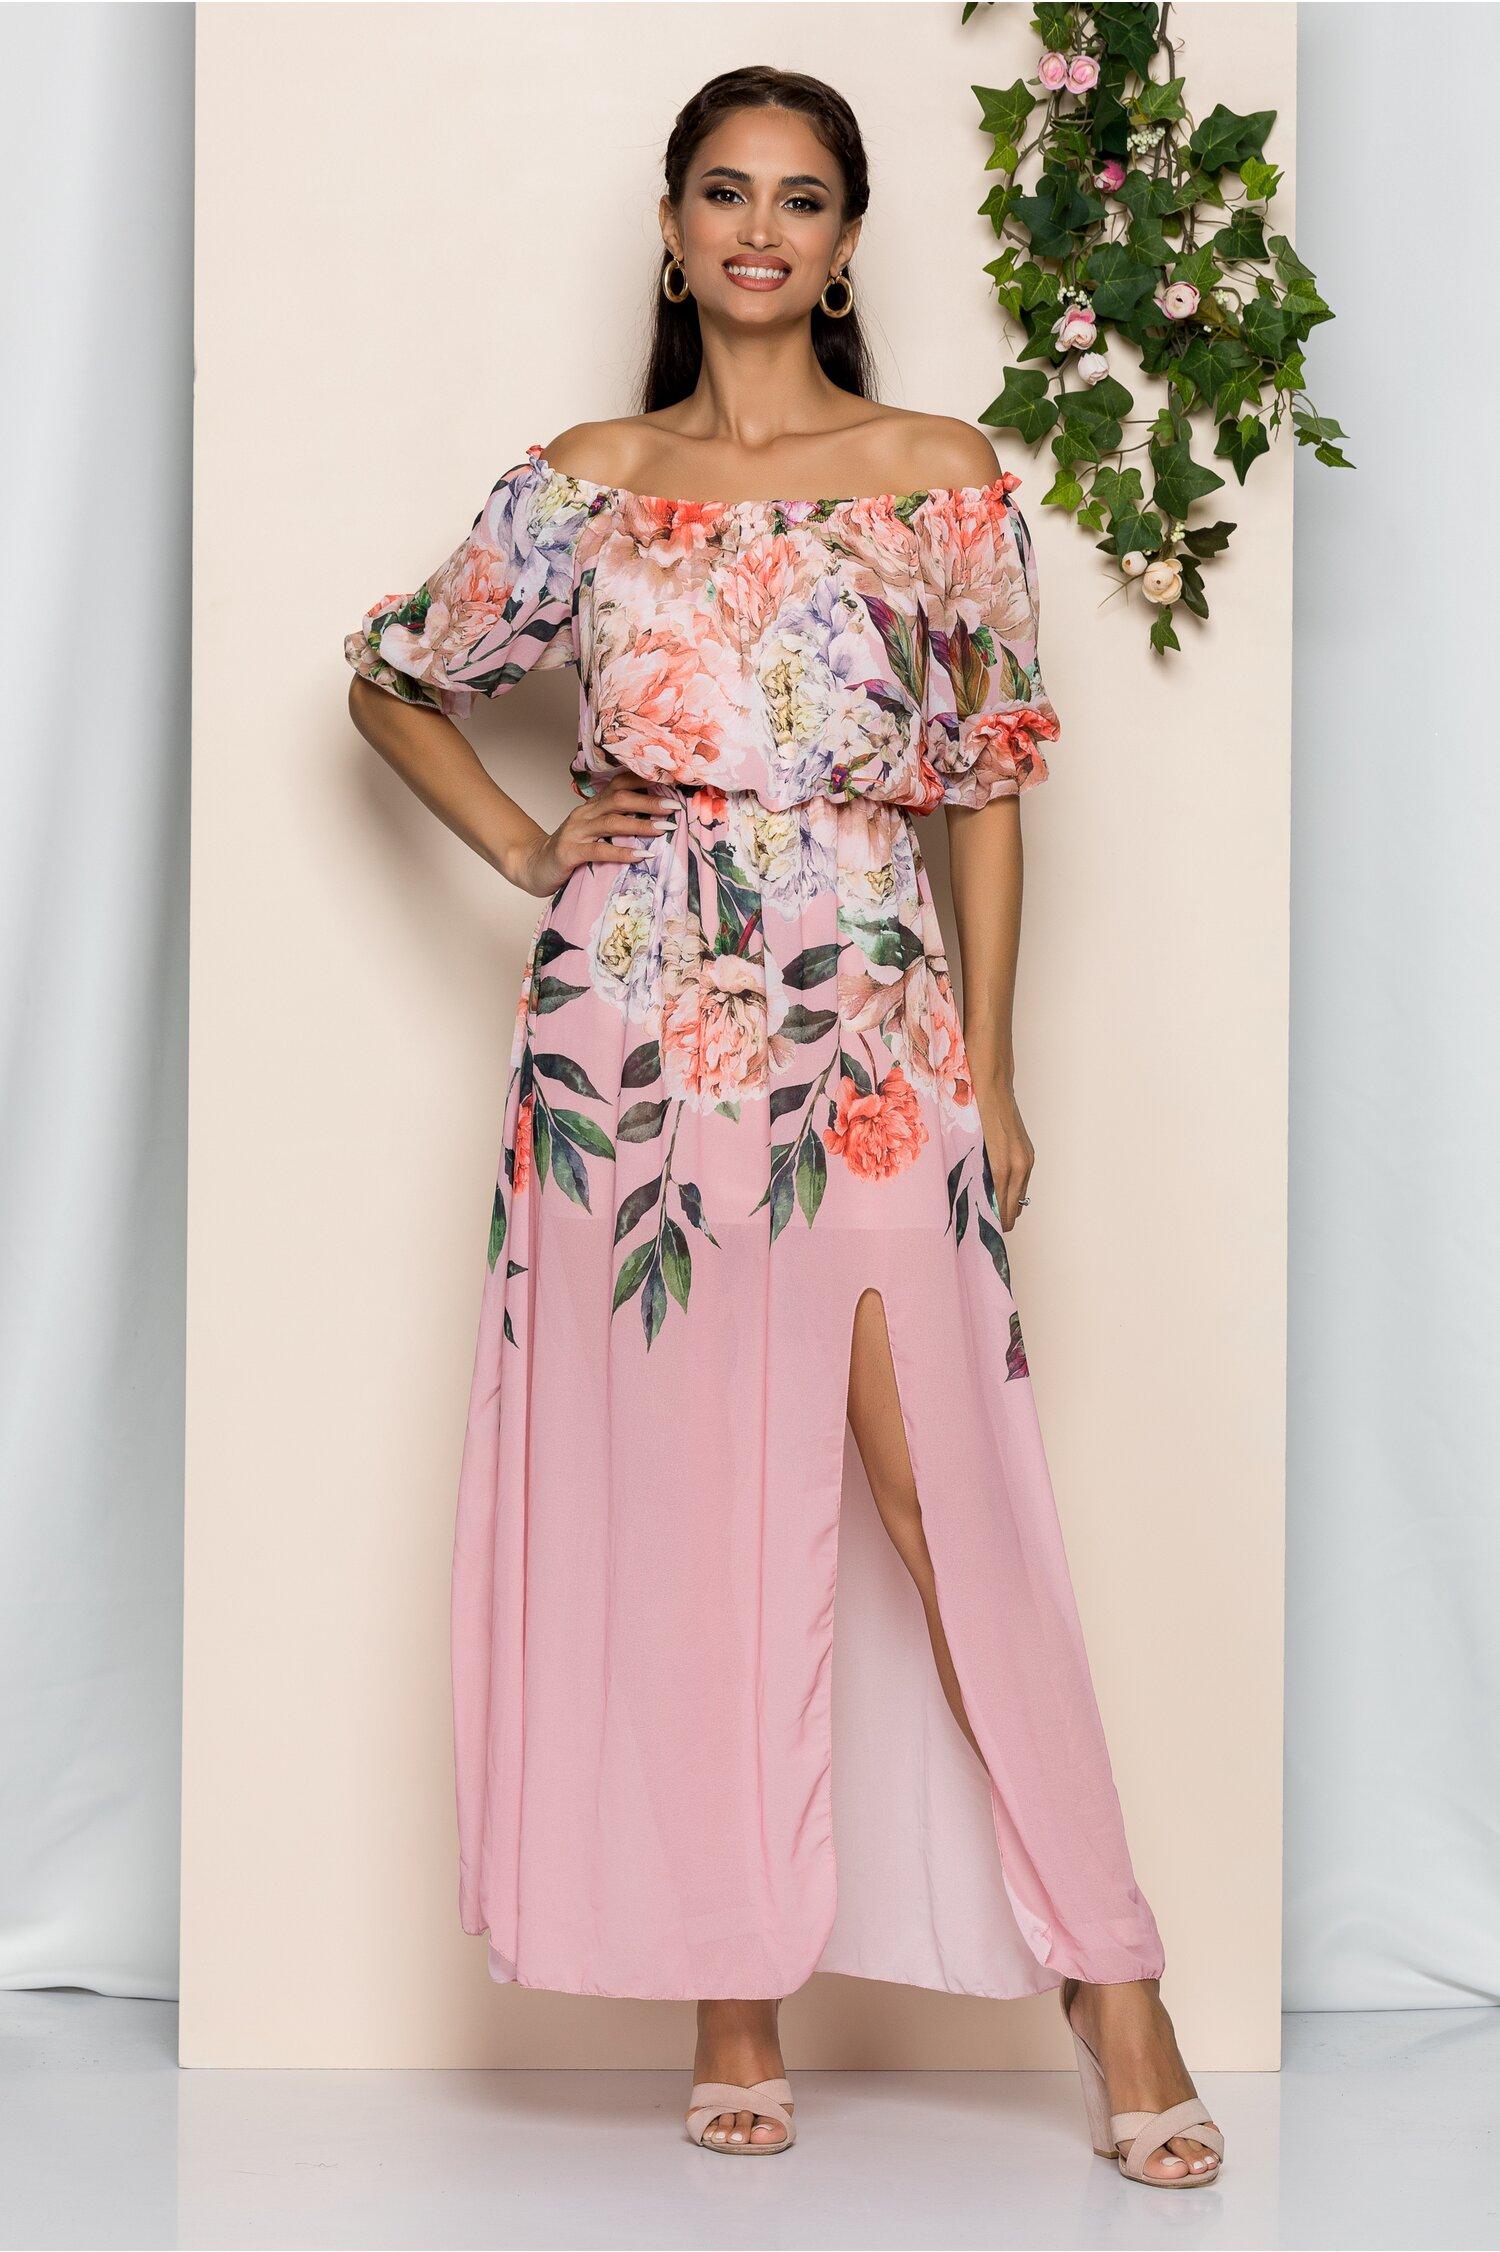 Rochie Manisha roz cu imprimeu floral si elastic la umeri